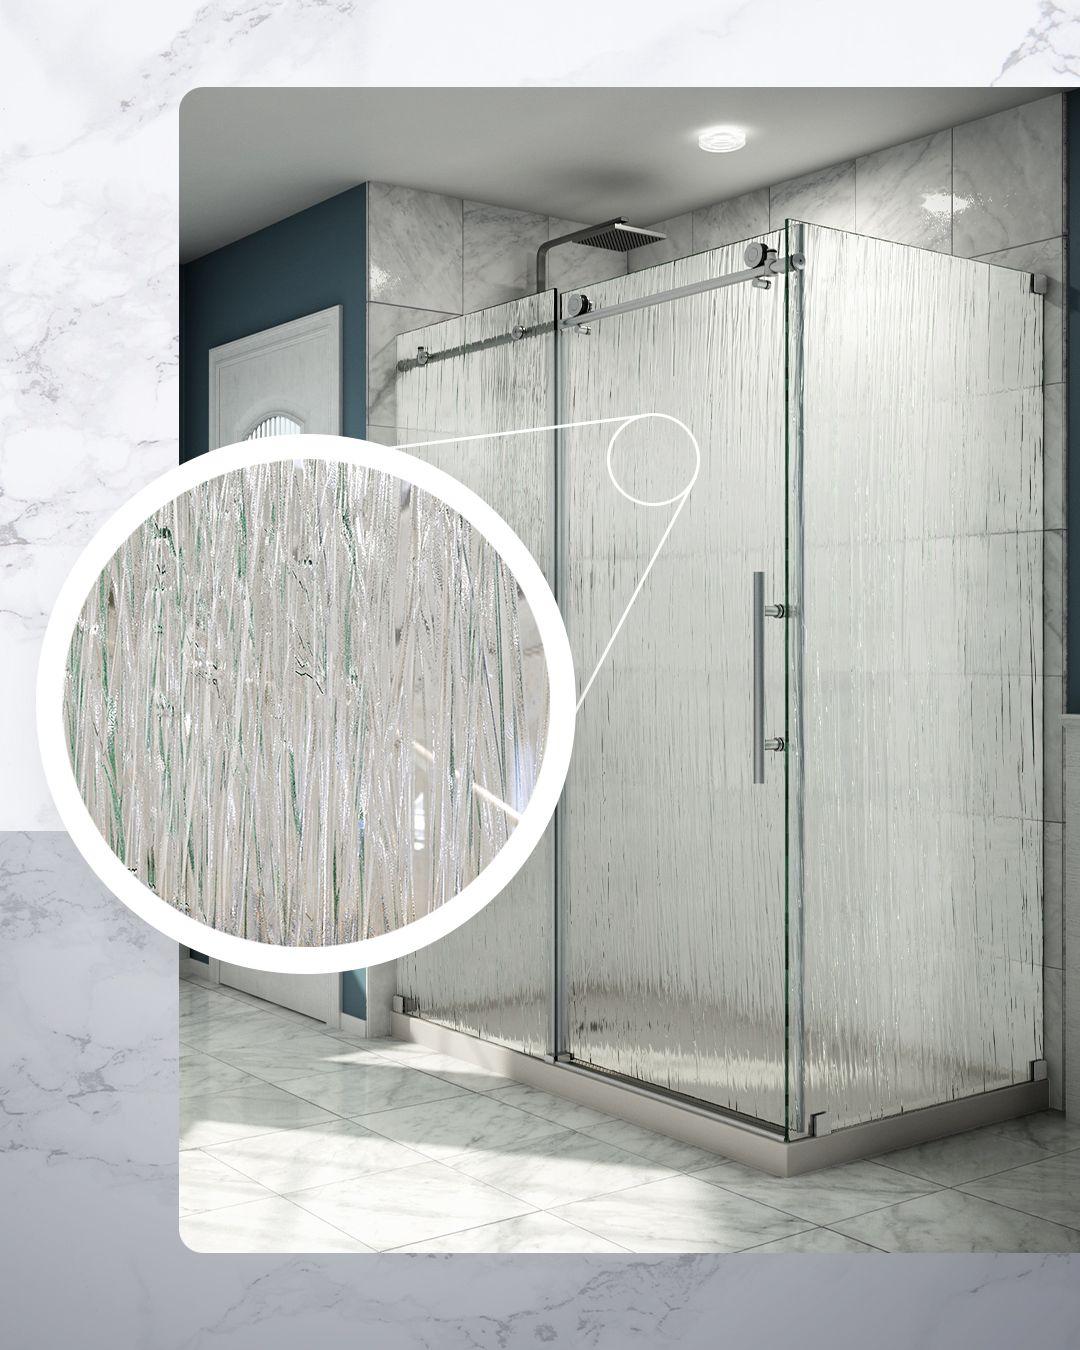 Enhance Your Bathroom Design With A Custom Glass Shower Door From Dreamline With Textured Rain Glass In 2020 Shower Doors Shower Door Designs Glass Shower Doors